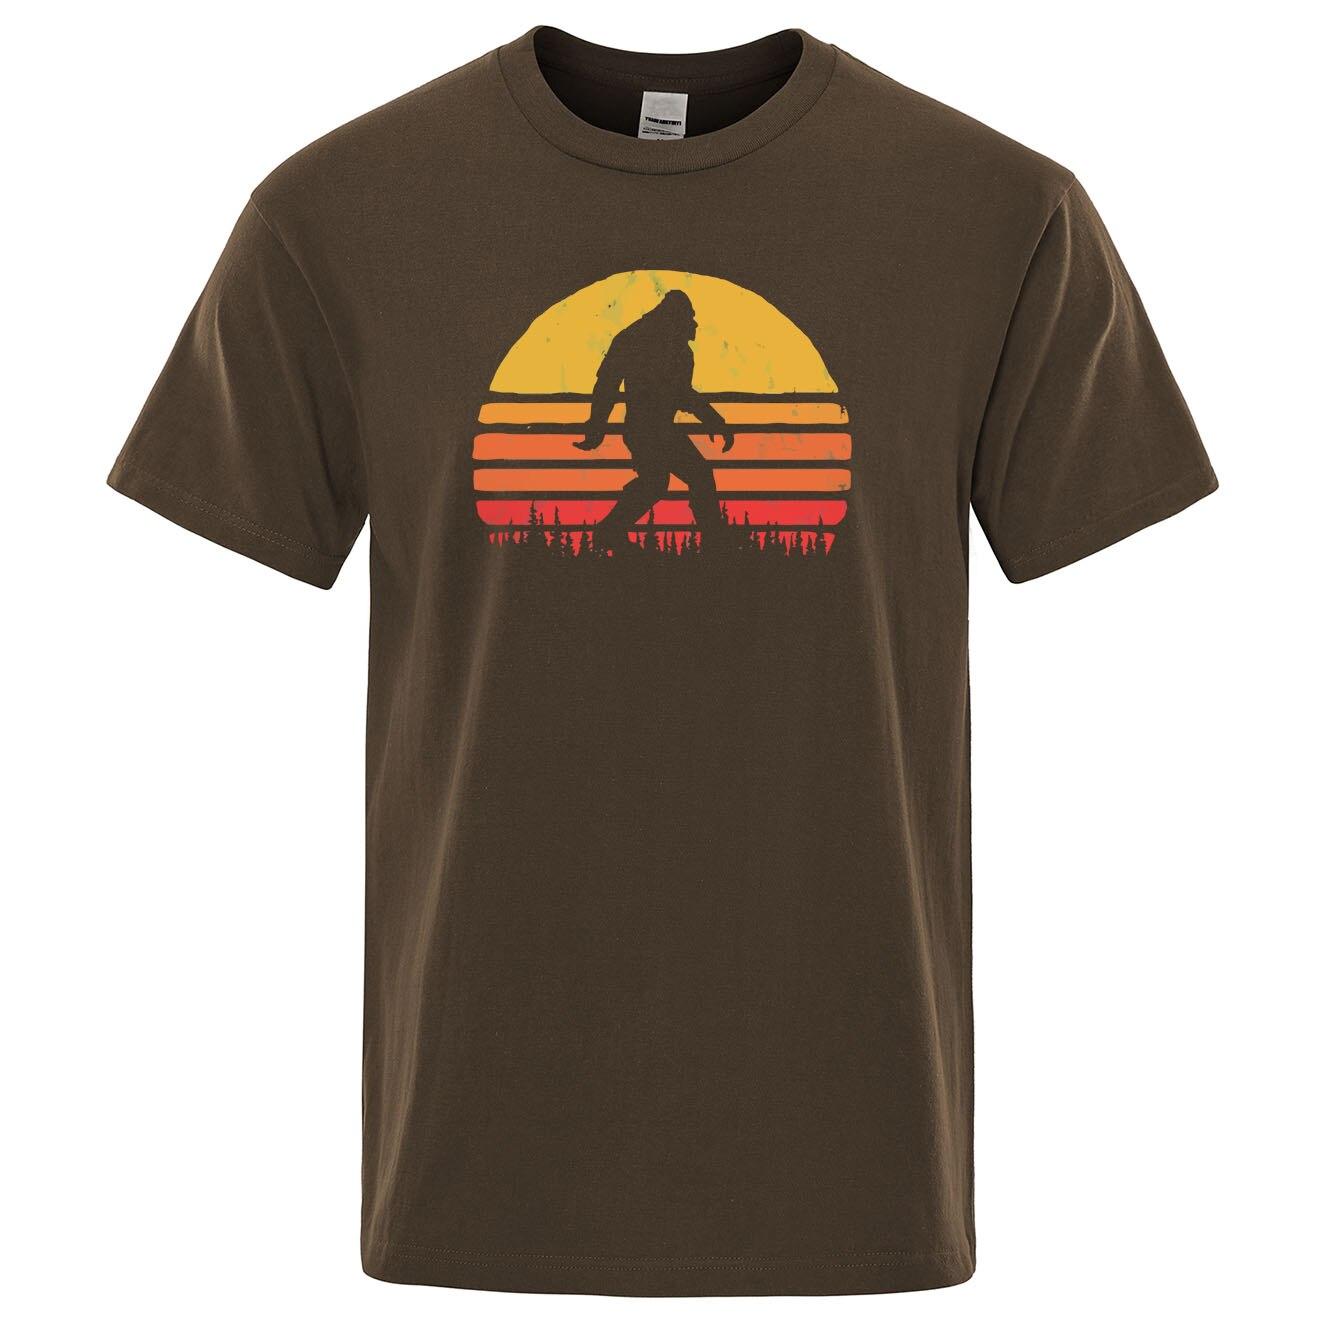 Retro Bigfoot Silhouette Sun Vintage - Believe! T-shirt Men Short Sleeve 2019 Summer Cotton Brand Tops Casual Funny Tee Shirt